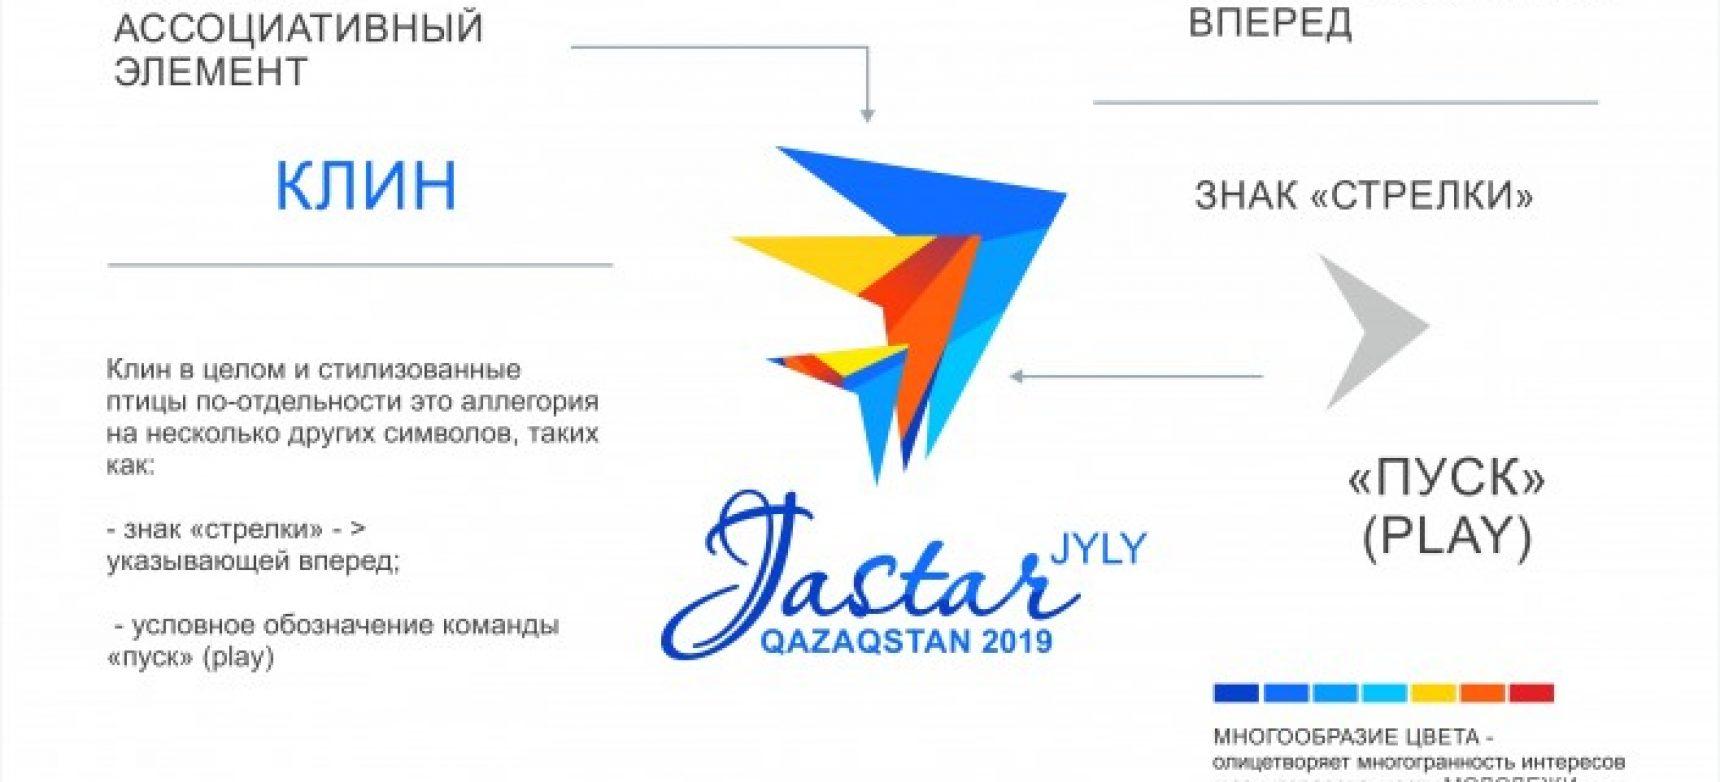 Логотип Годa молодежи в Казахстане